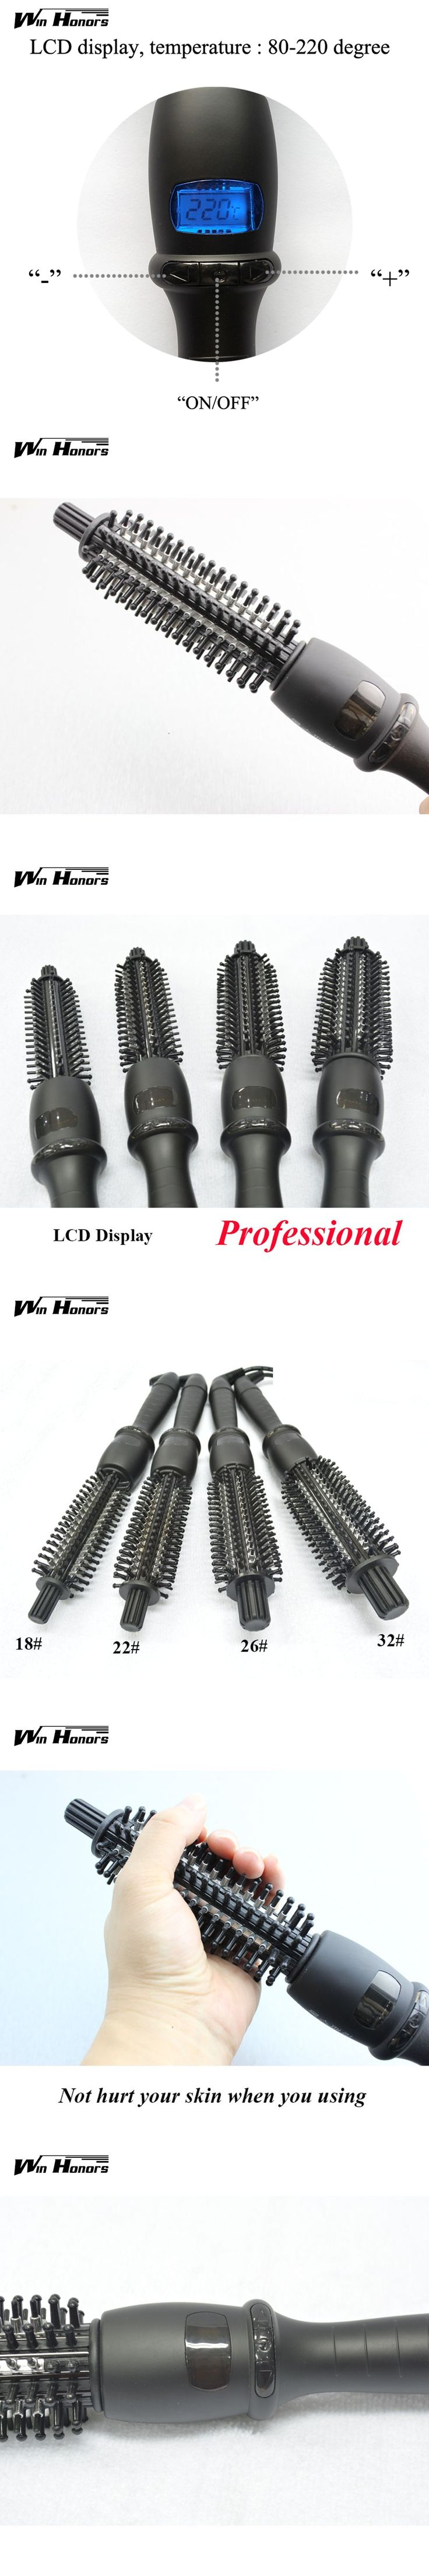 Professional Electric Hair Brush Hair Curlers Rollers Black Ceramic LCD Screen Hair Curler Curling Wand Iron Hair Care Tools